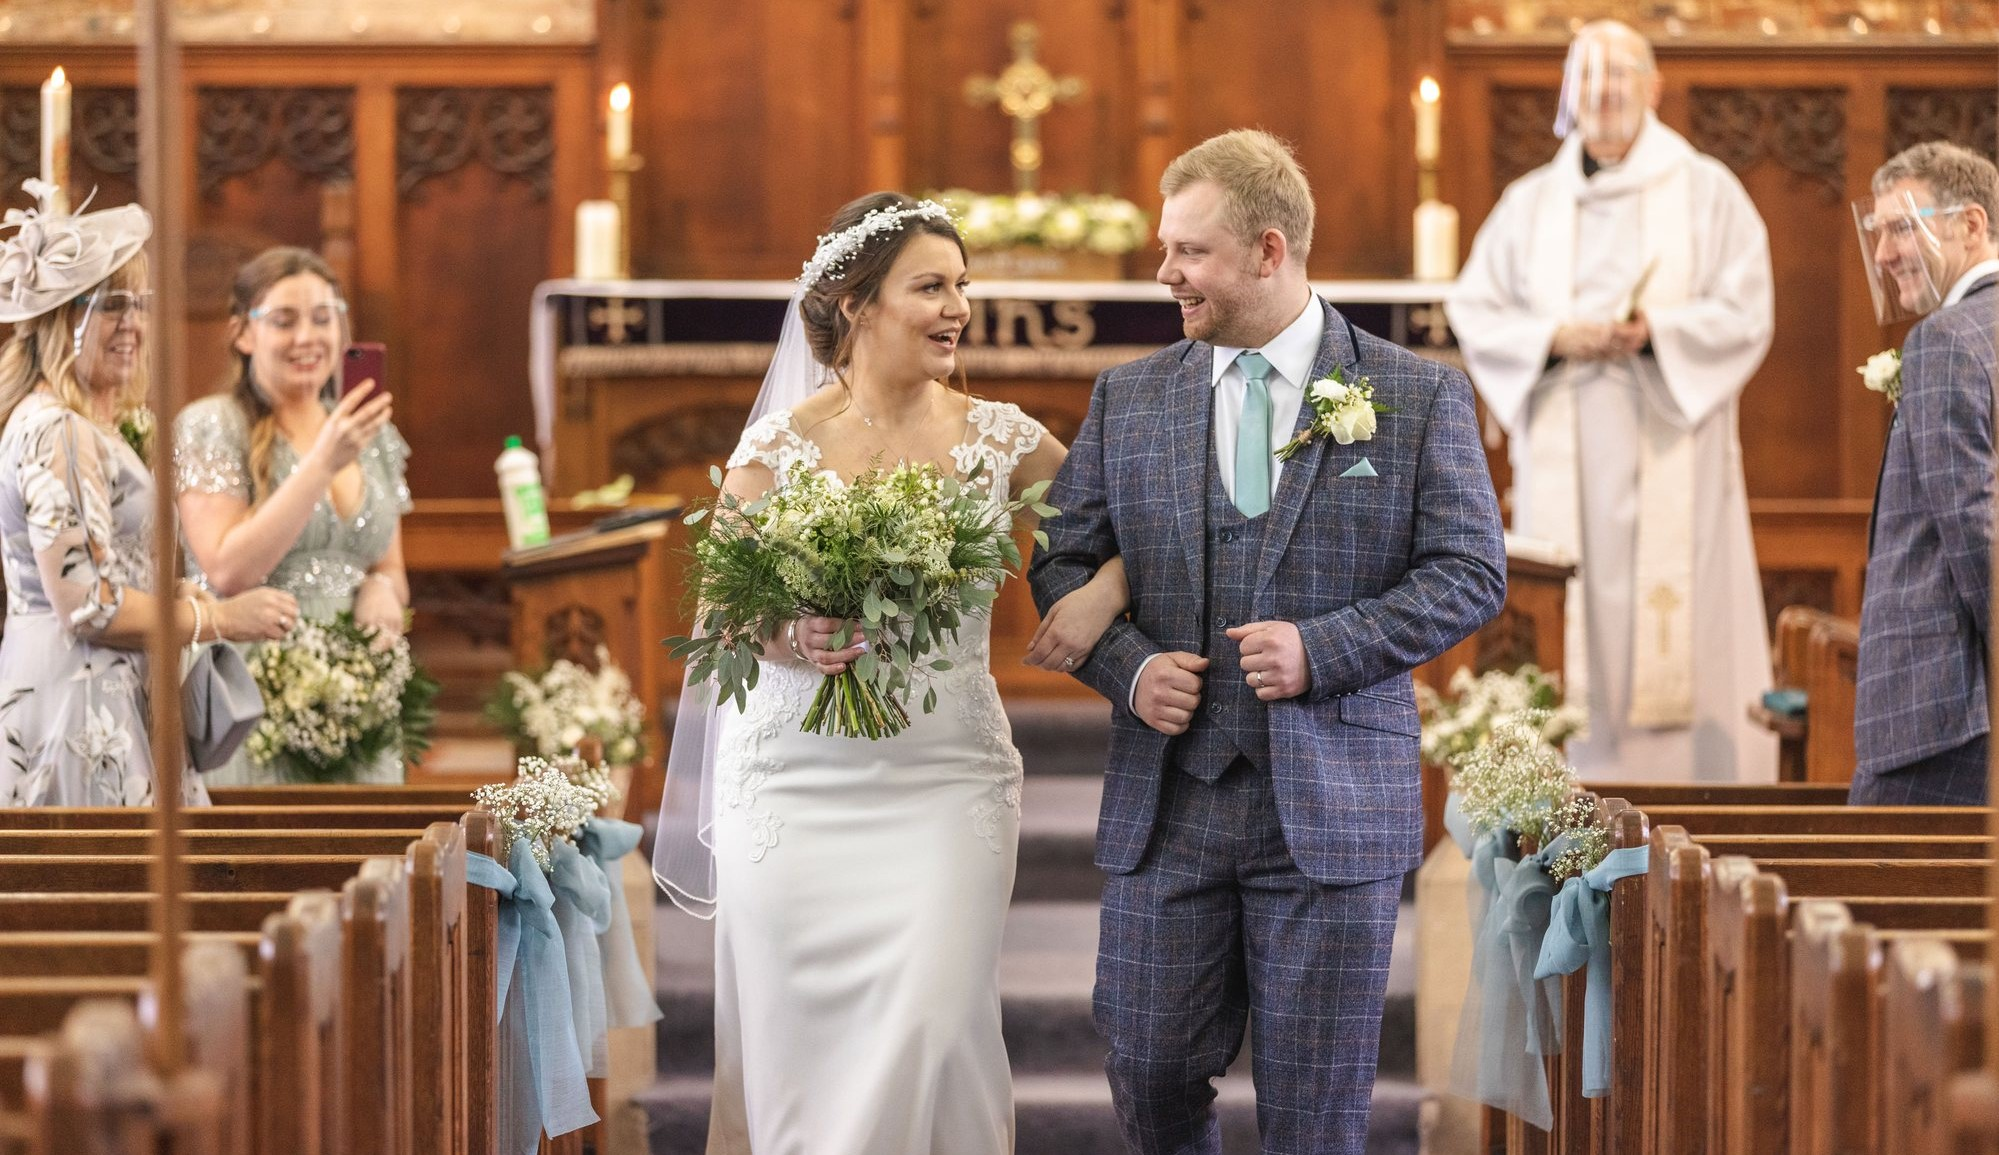 bride and groom aisle walk west yorkshire wedding st johns church rishworth oxfordshire wedding photography